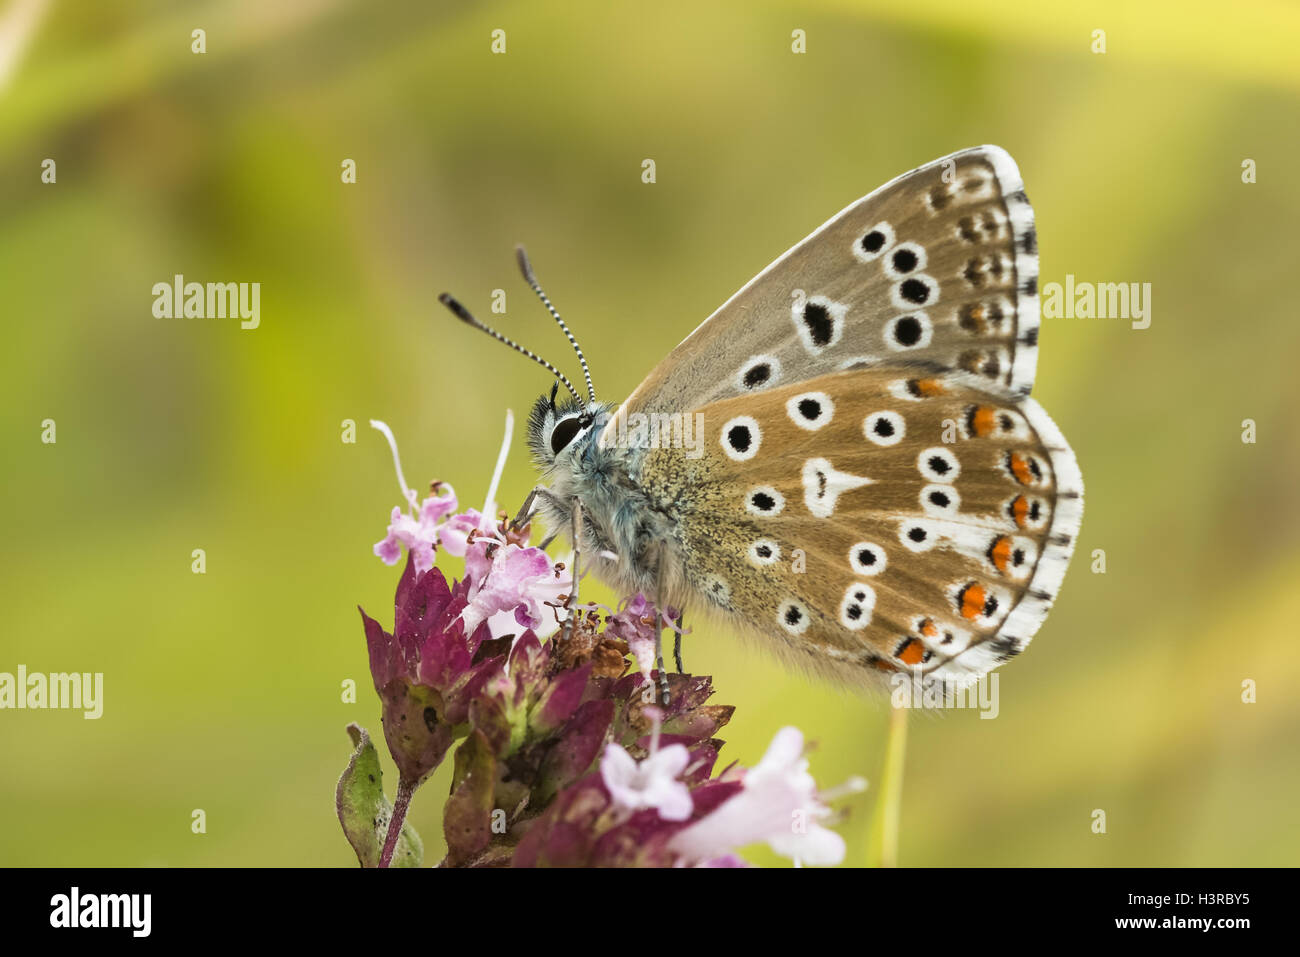 Adonis mâle Blue Butterfly (Polyommatus bellargus / Lysandra) sur la Marjolaine Photo Stock